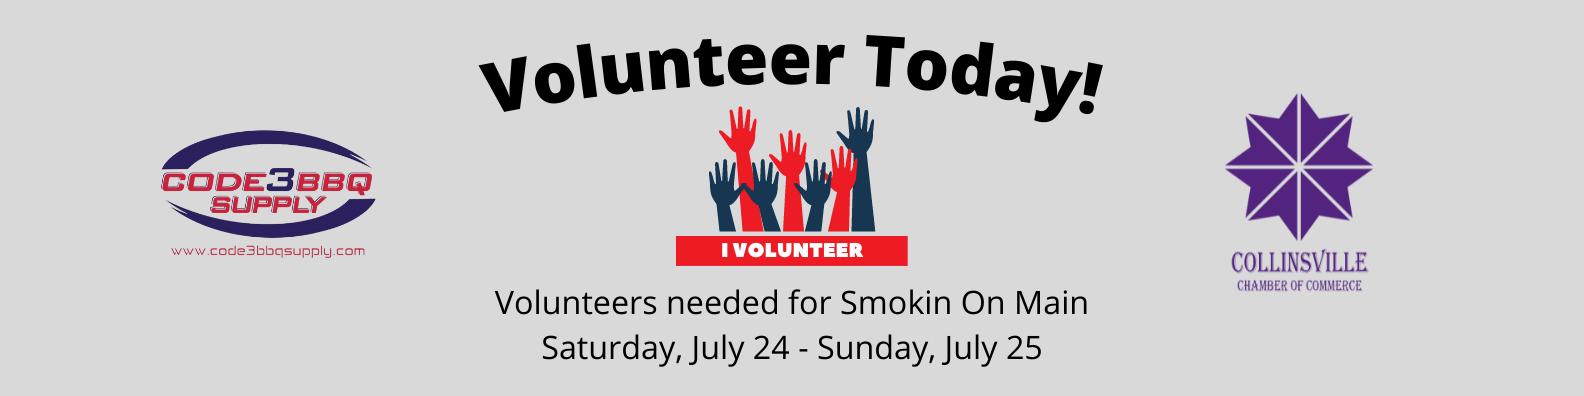 Copy-of-Copy-of-Copy-of-Copy-of-Red-and-Blue-Hands-Volunteers-Group-T-Shirt.png